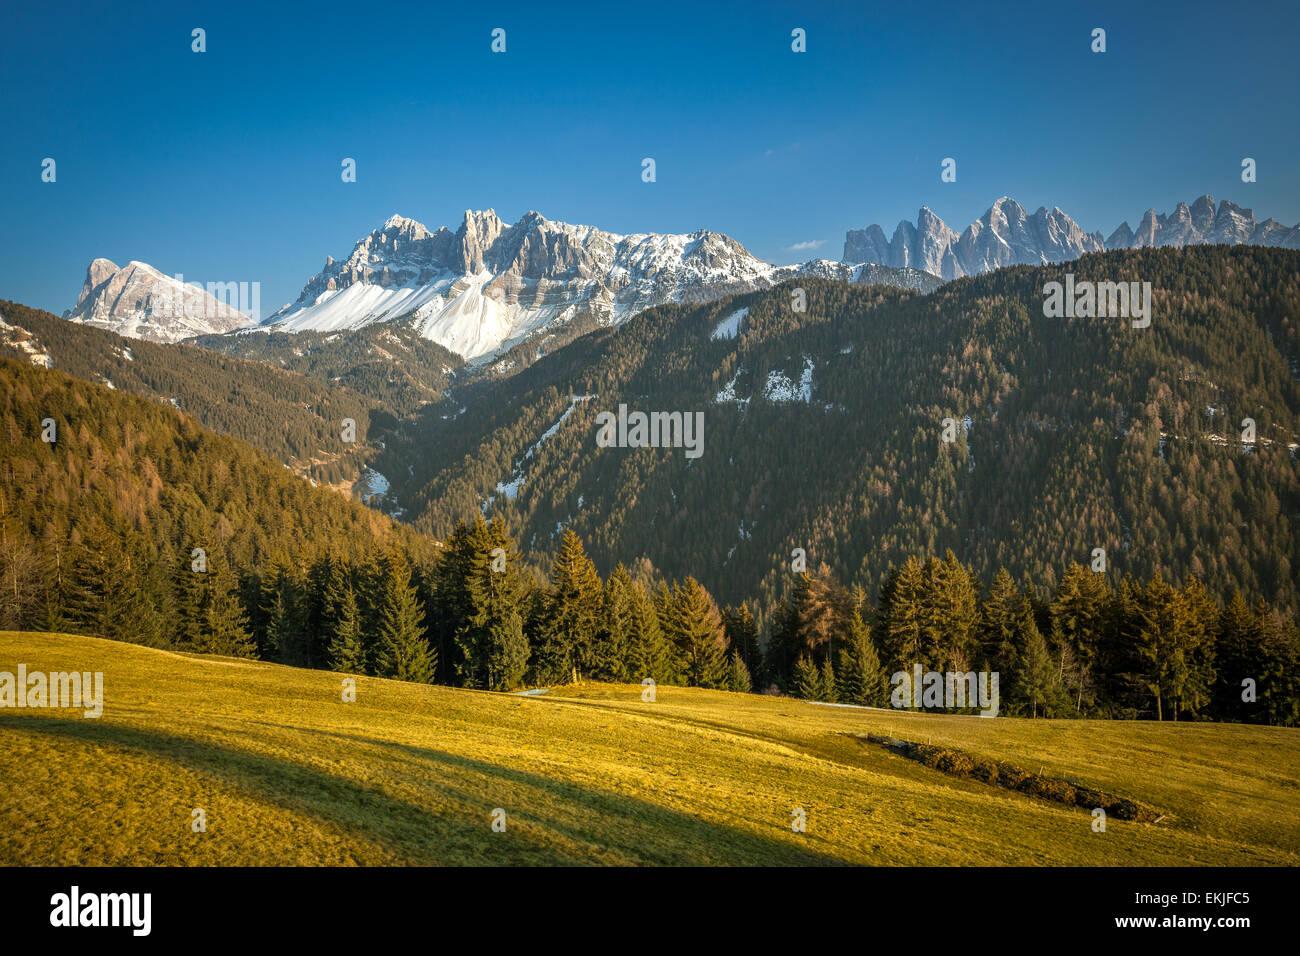 Dolomiten (Dolomiti) betrachtet aus Passo Delle Erbe, in Südtirol, Trentino Alto Adige, Norther Italien Stockbild